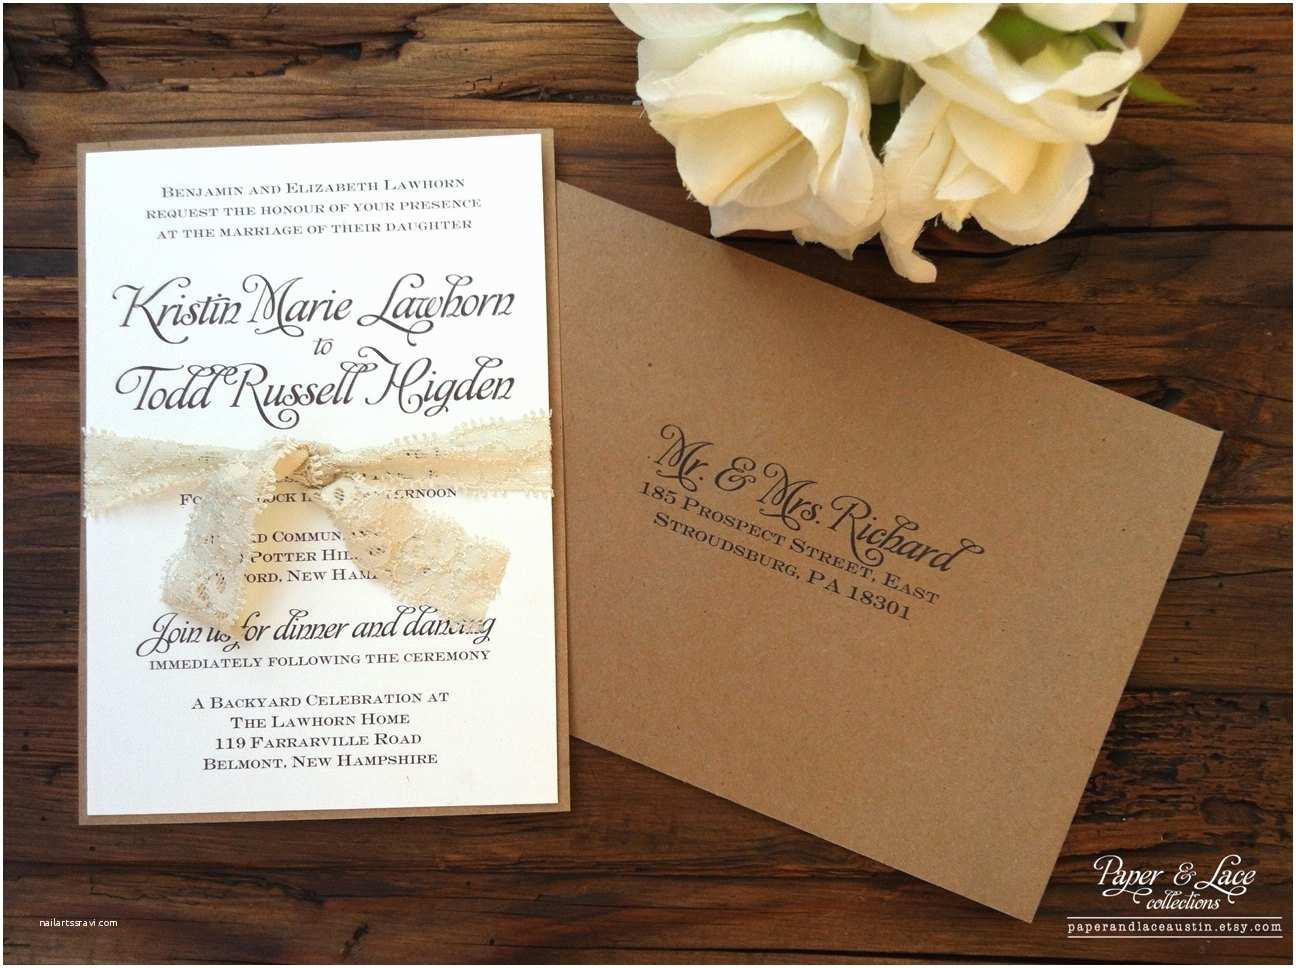 Wedding Invitation Paper Kraft Paper & Lace Wedding Invitation Sample